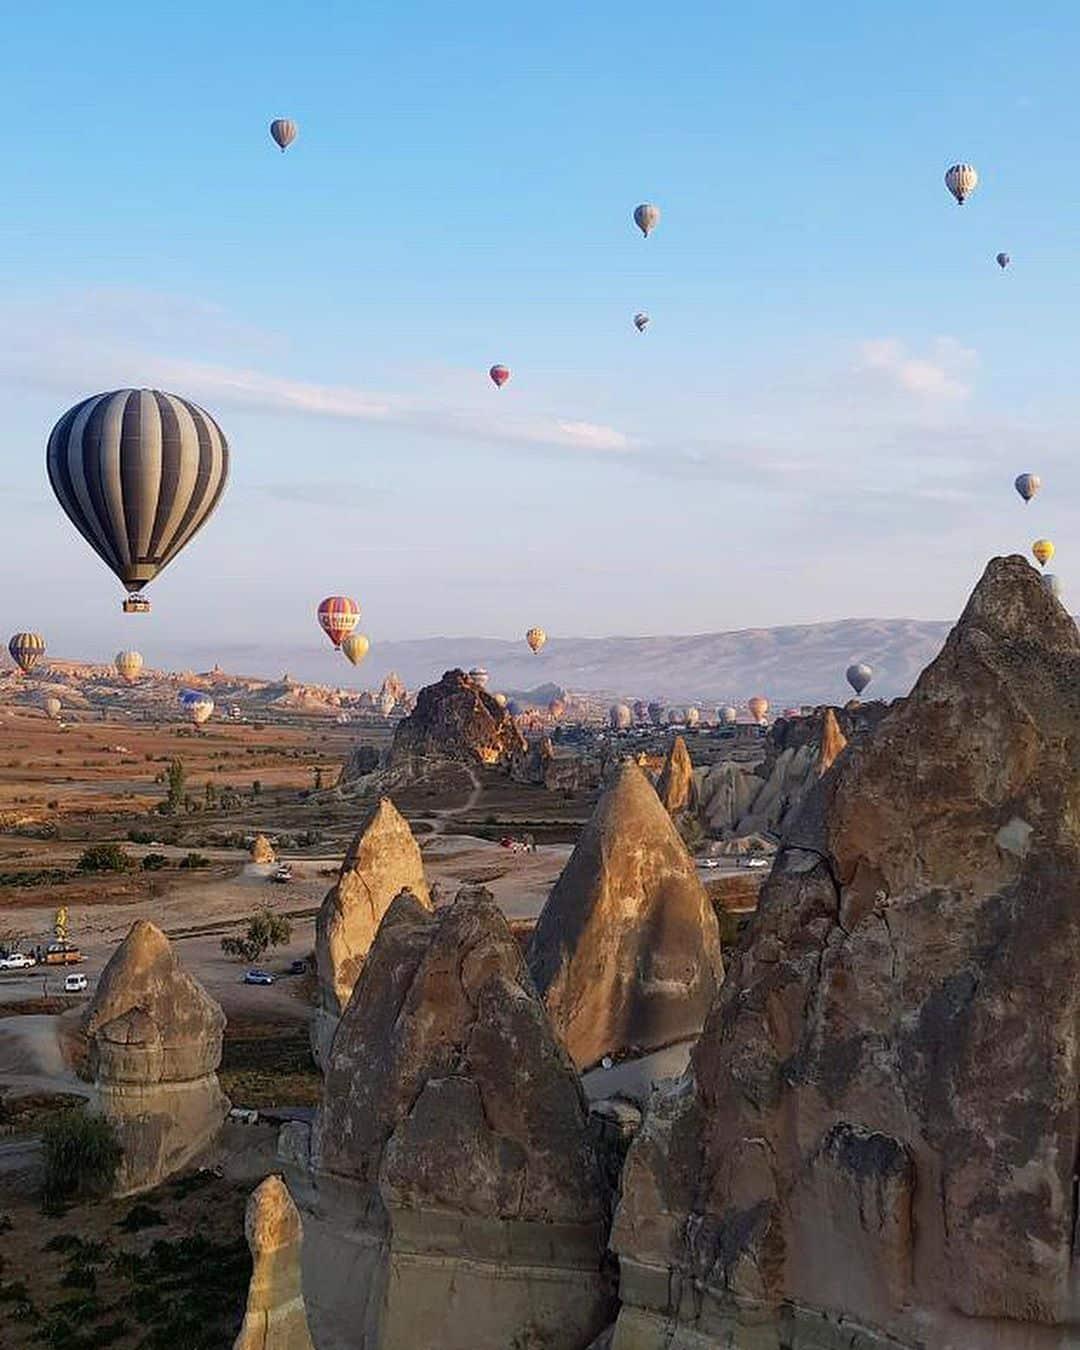 Menikmati Bentang Alam Kapadokia Turki Dari Atas Balon Udara 1